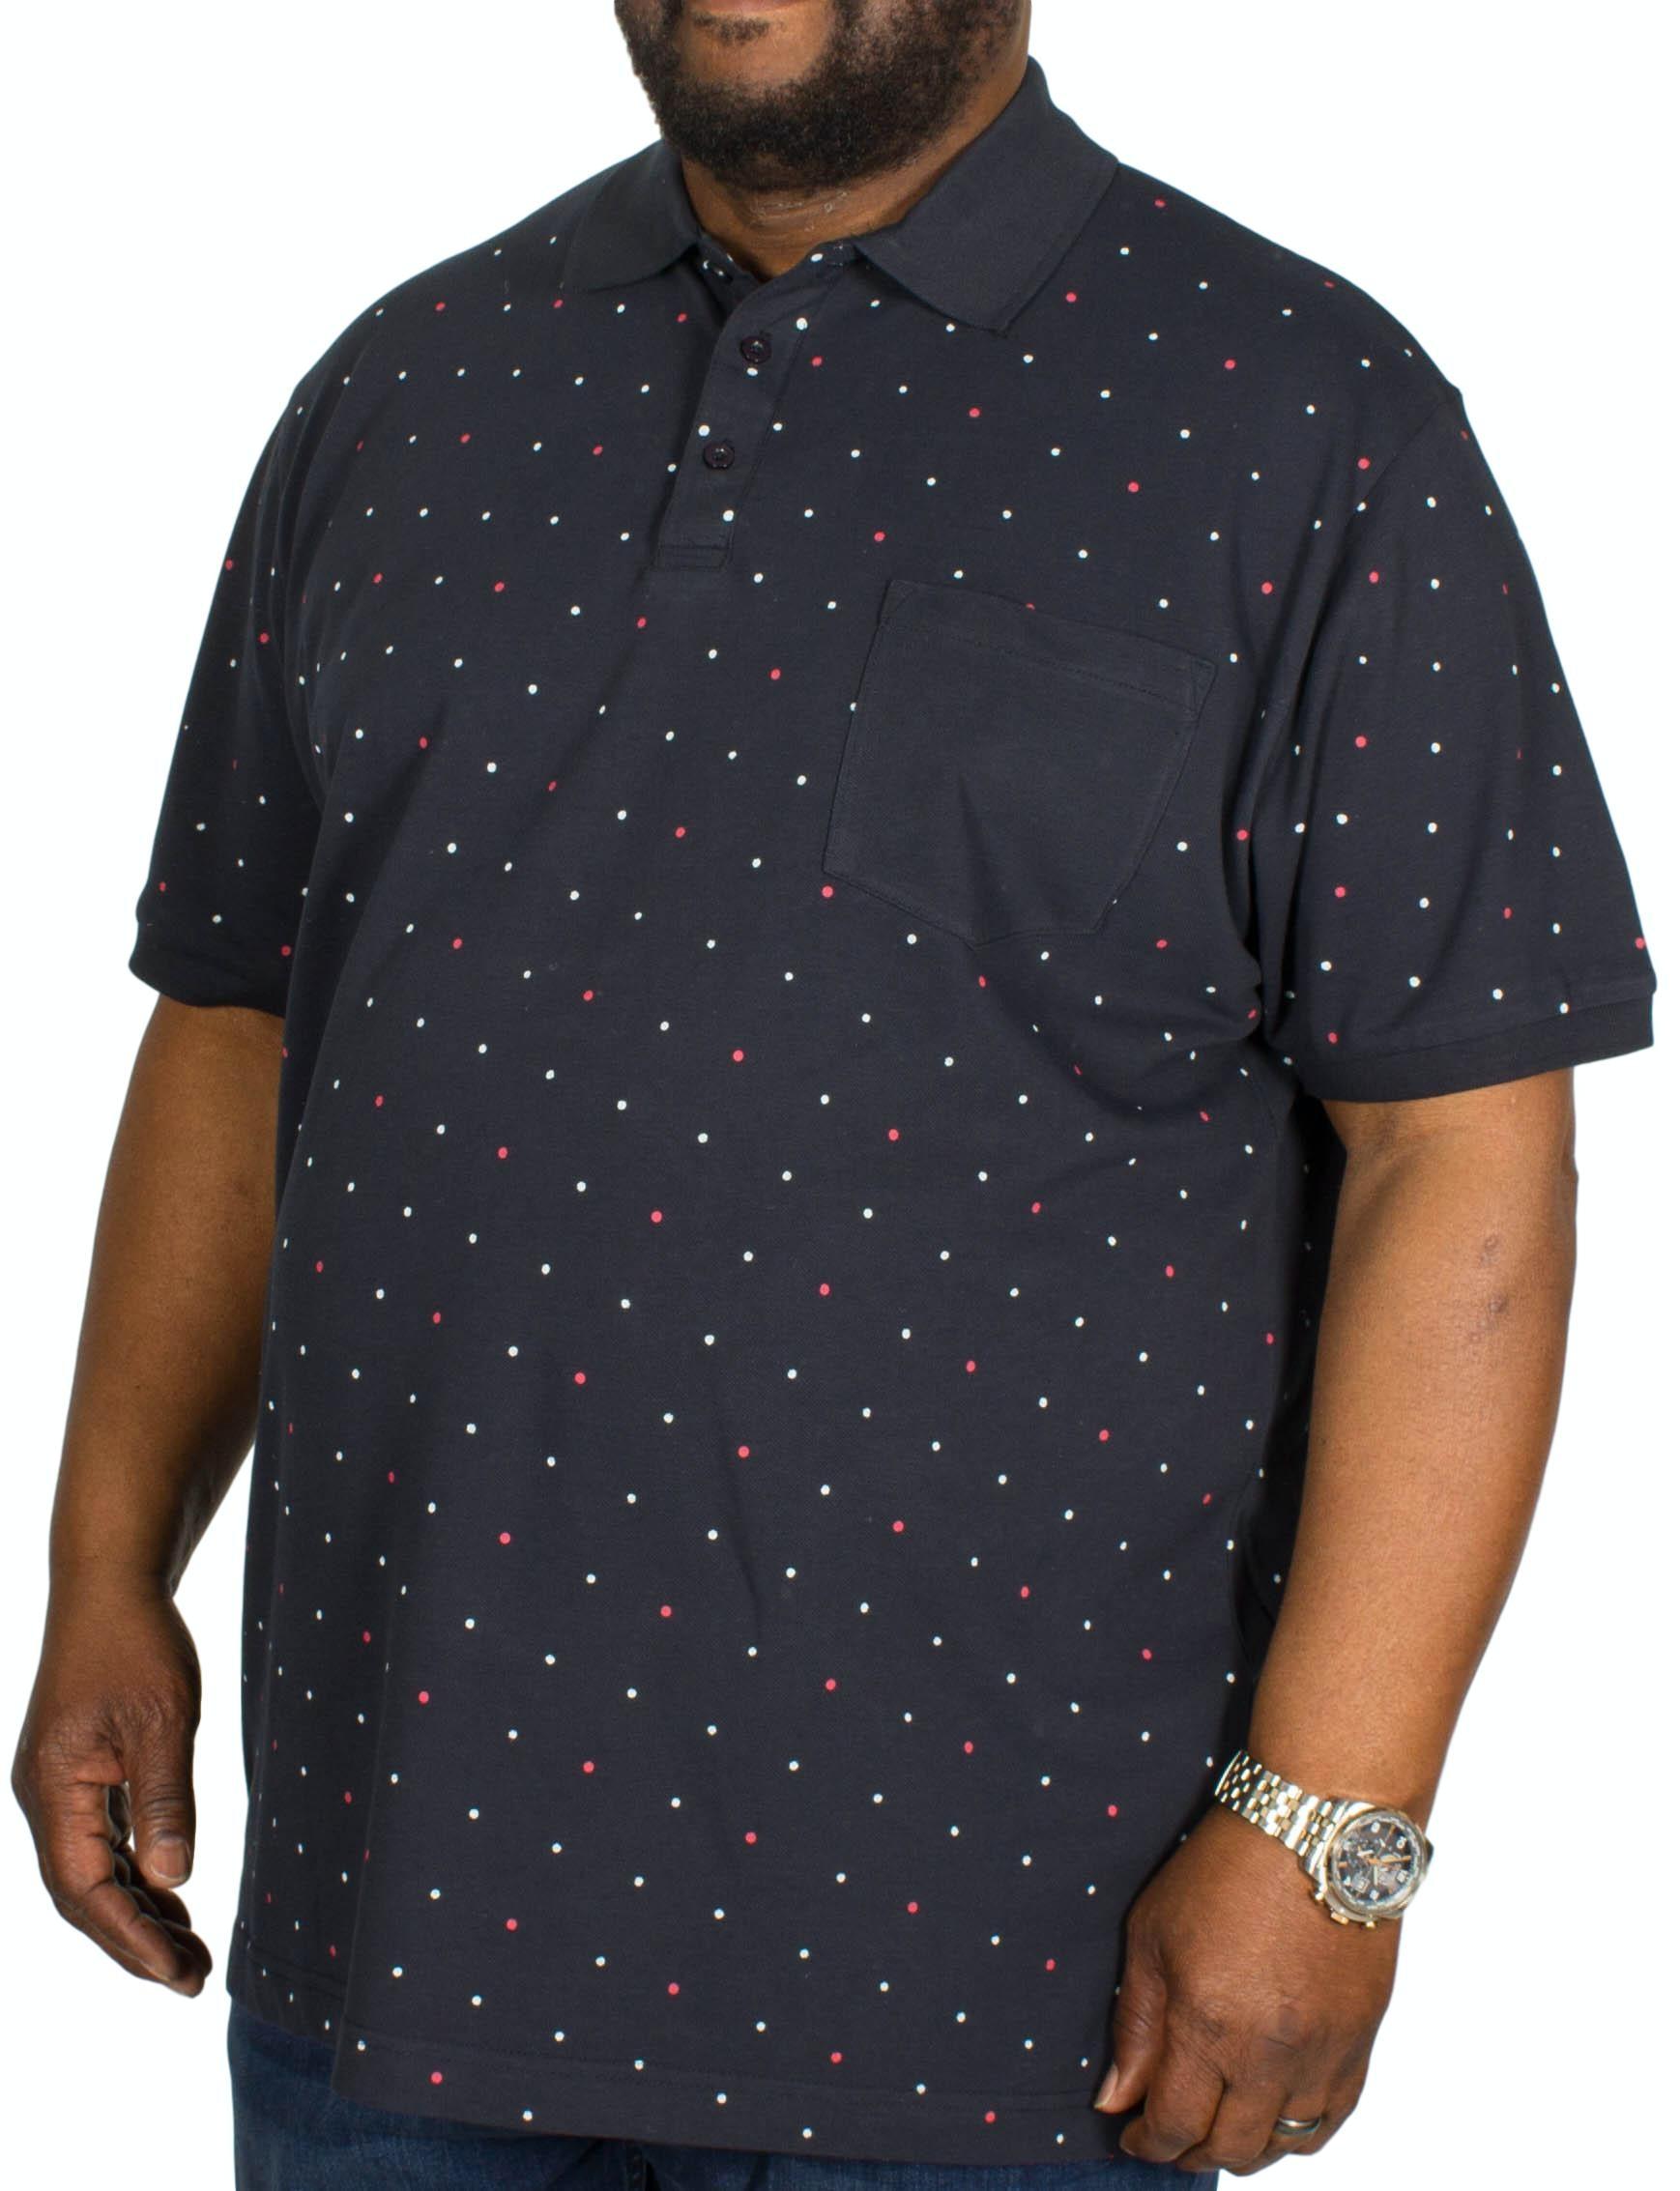 Bigdude Dotted Polo Shirt Navy